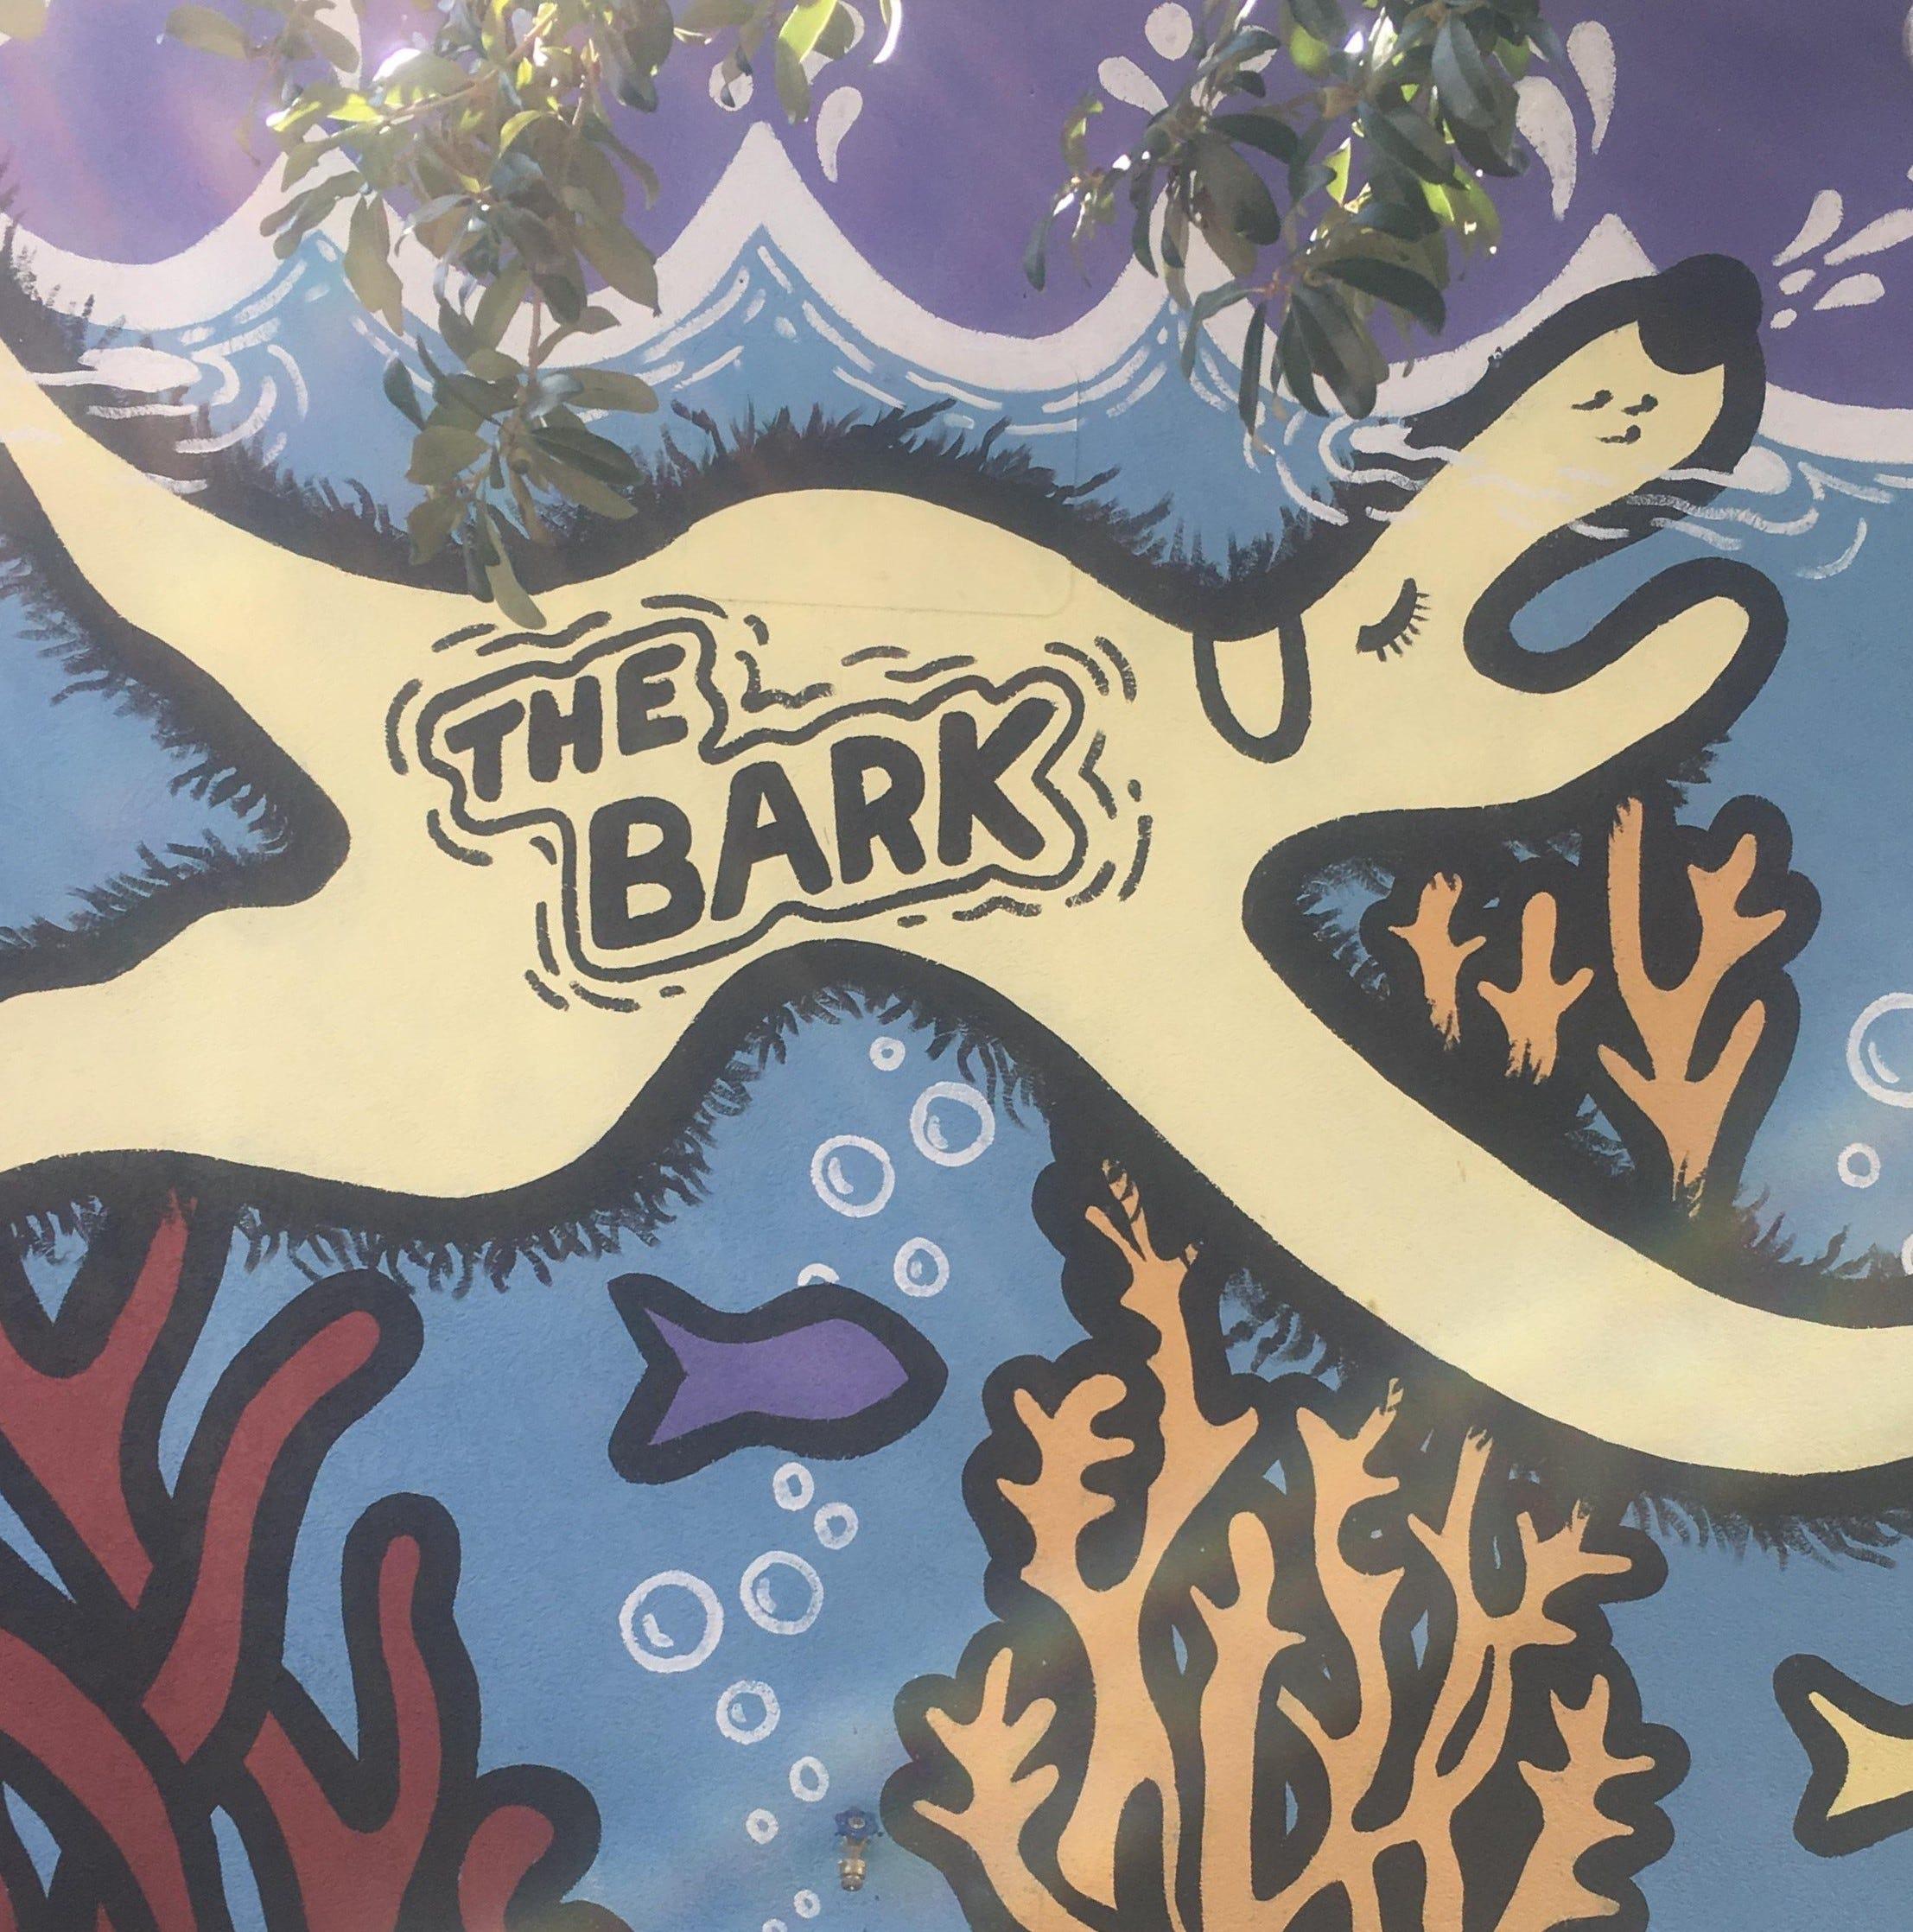 FSU Creative Writing says goodbye to The Warehouse, hello to The Bark